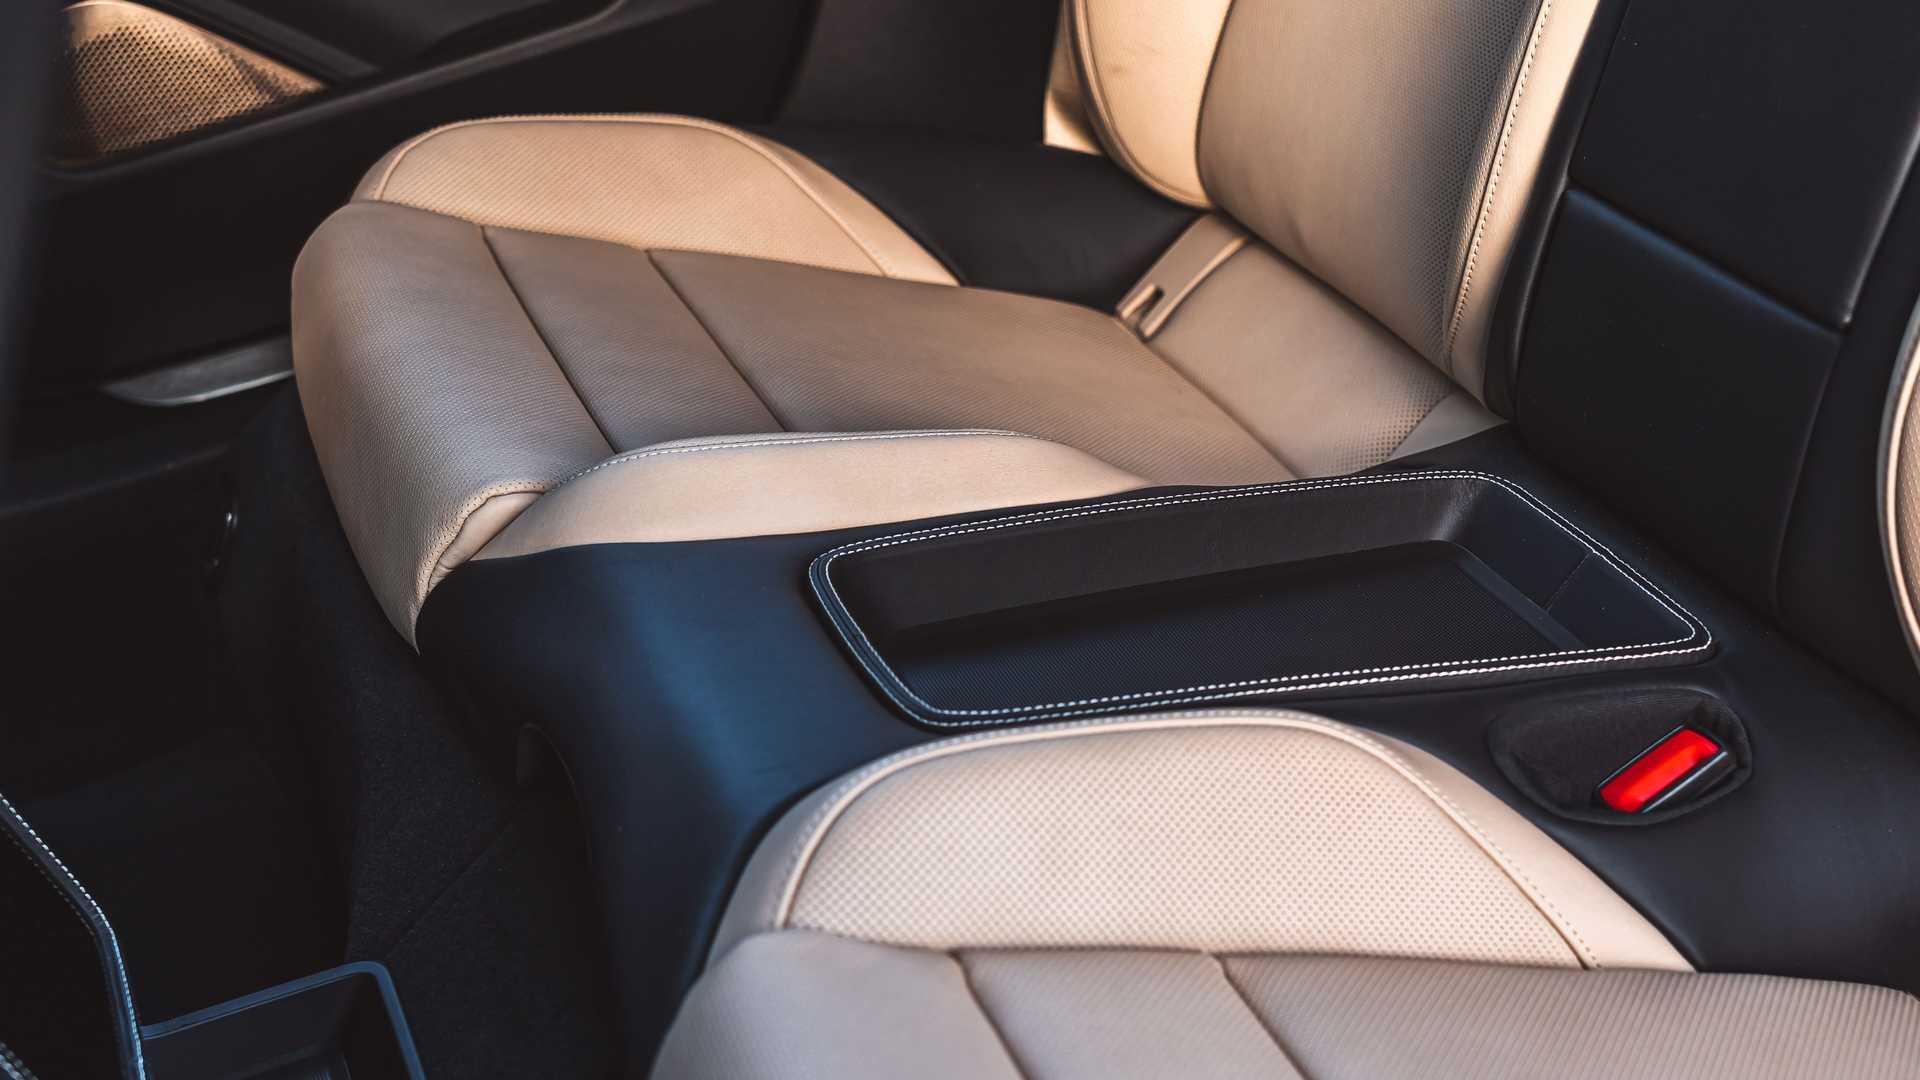 2021 porsche taycan turbo cross turismo interior rear seat details